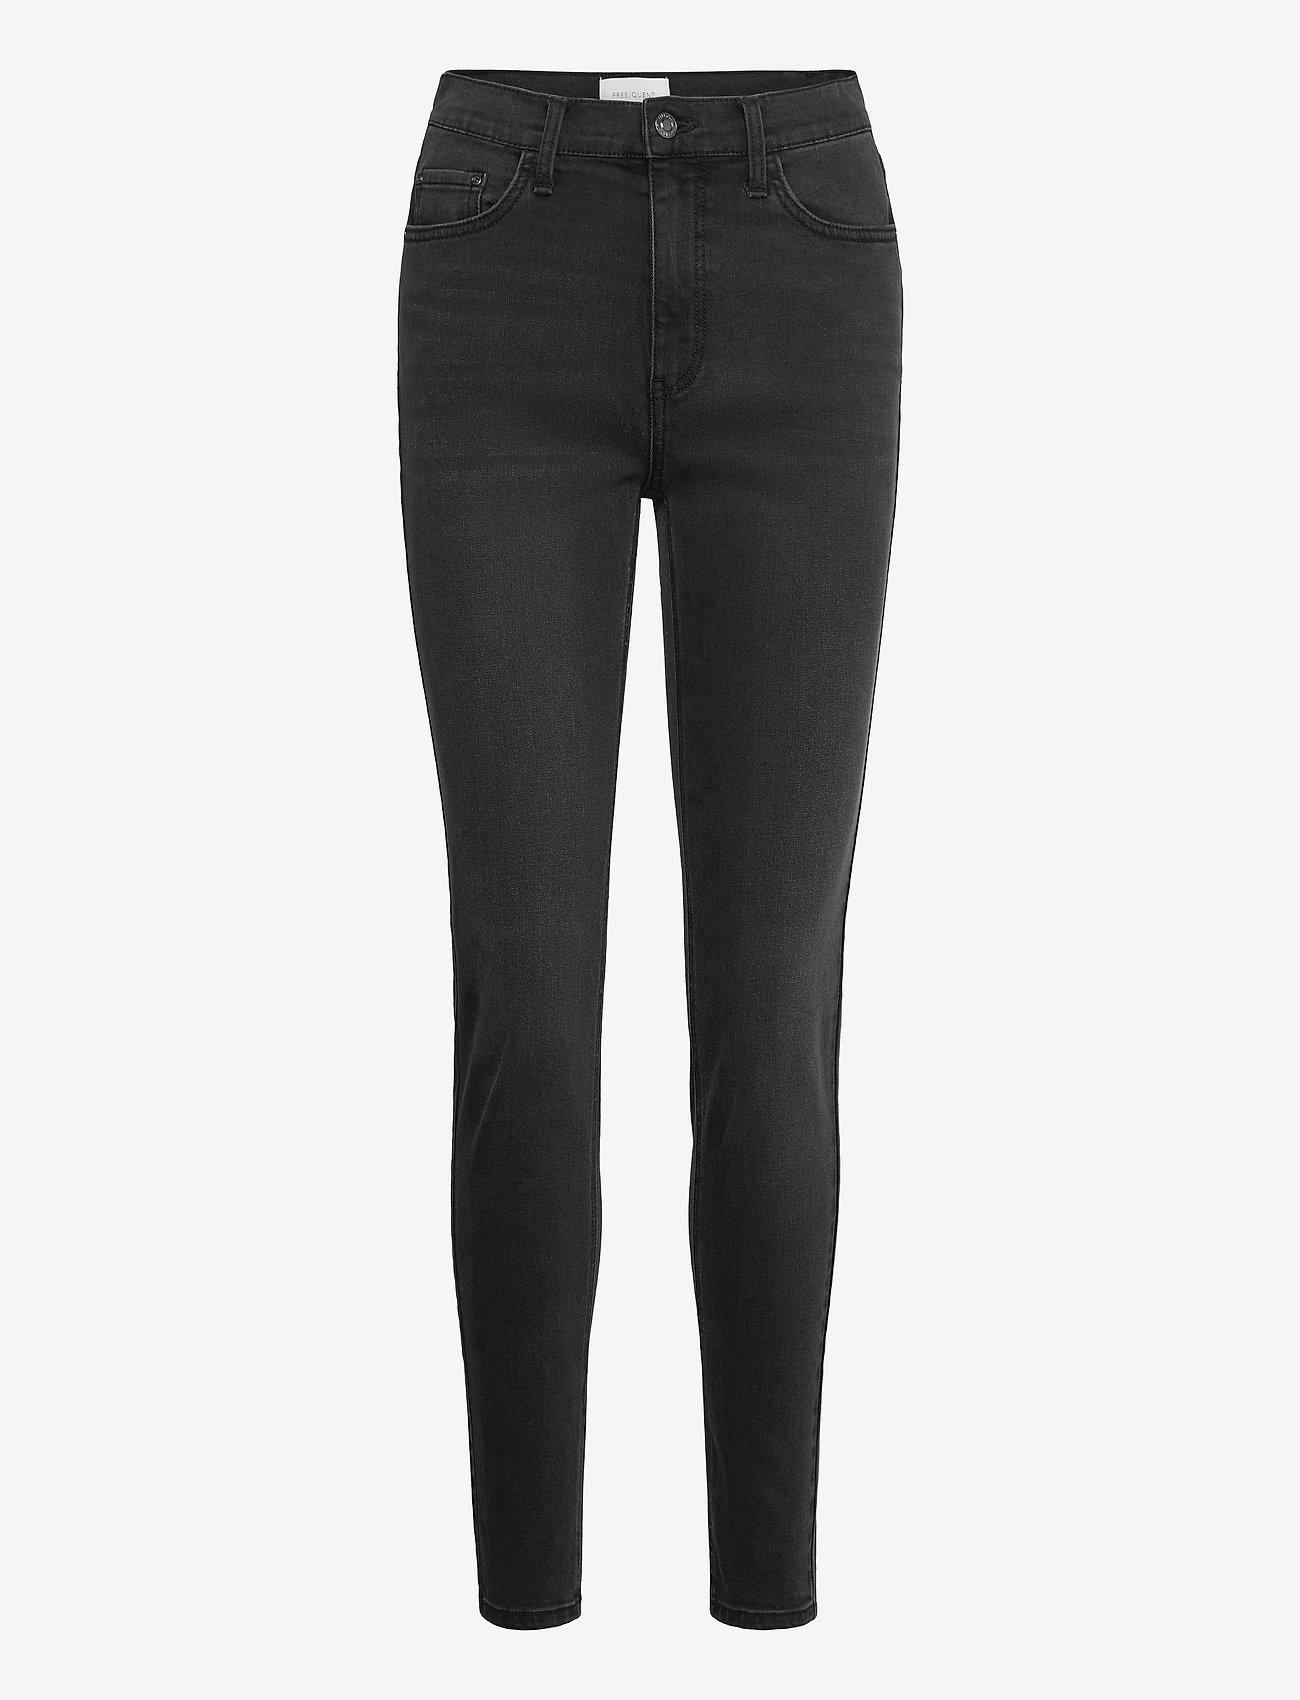 FREE/QUENT - FQHARLOW-JE-BLACK - slim jeans - black - 0